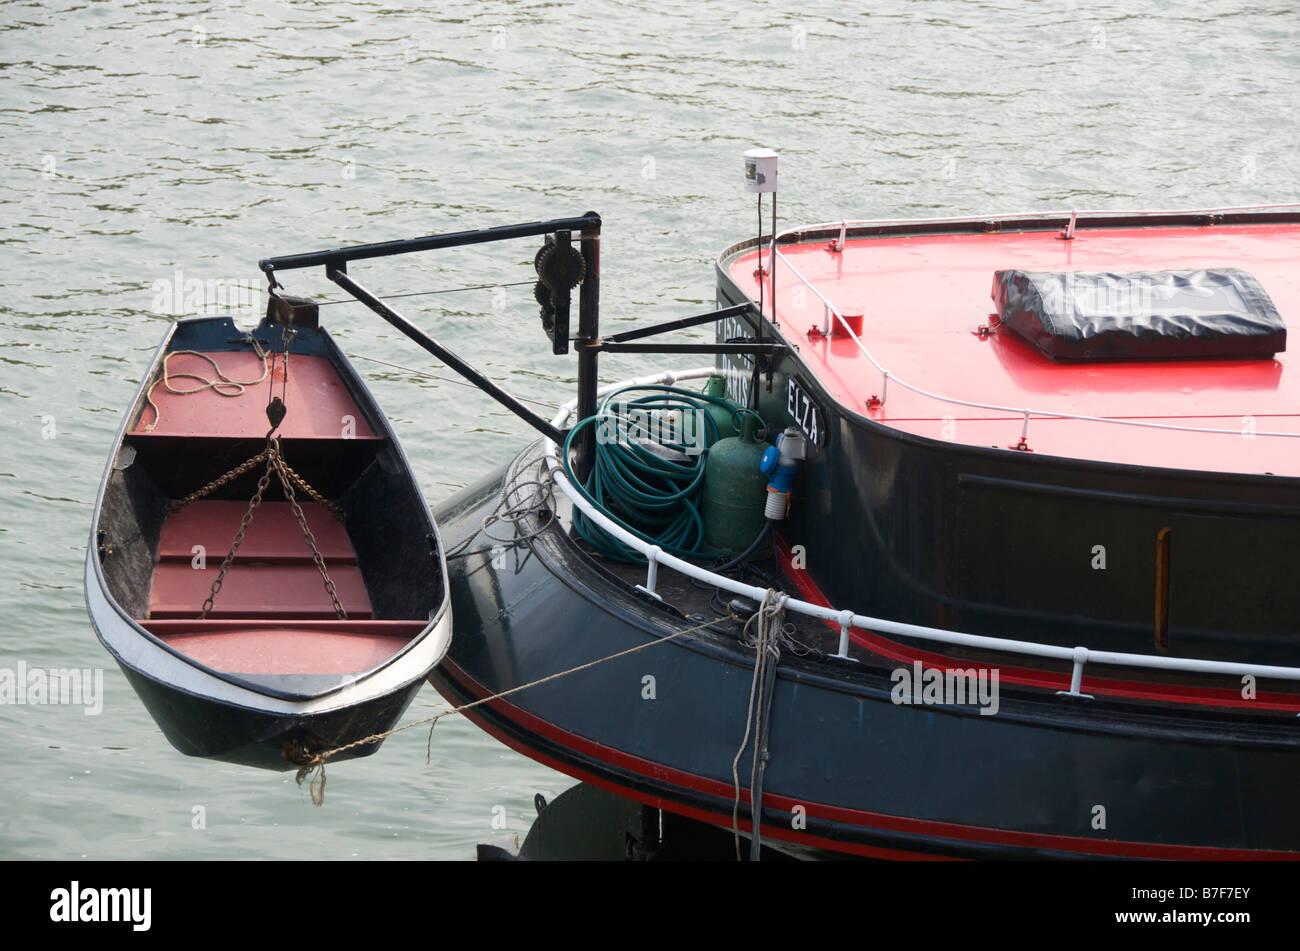 Lifeboat on a barge. Paris. Ile de France. France - Stock Image